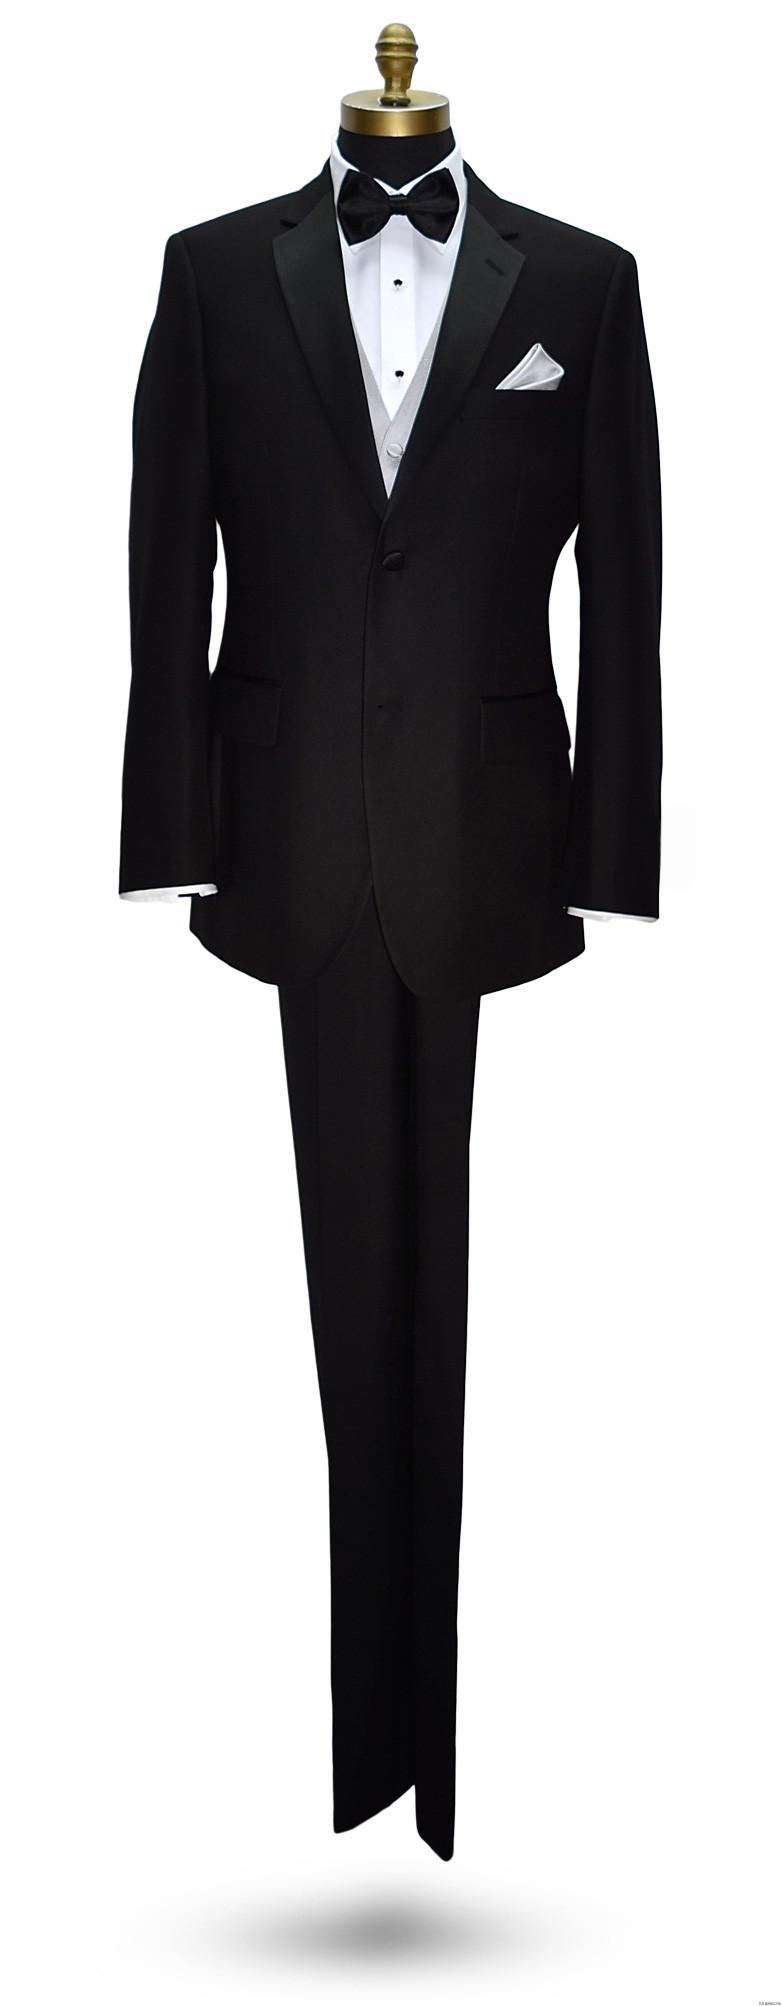 San Miguel black notch lapel tuxedo with light gray vest and black bowtie